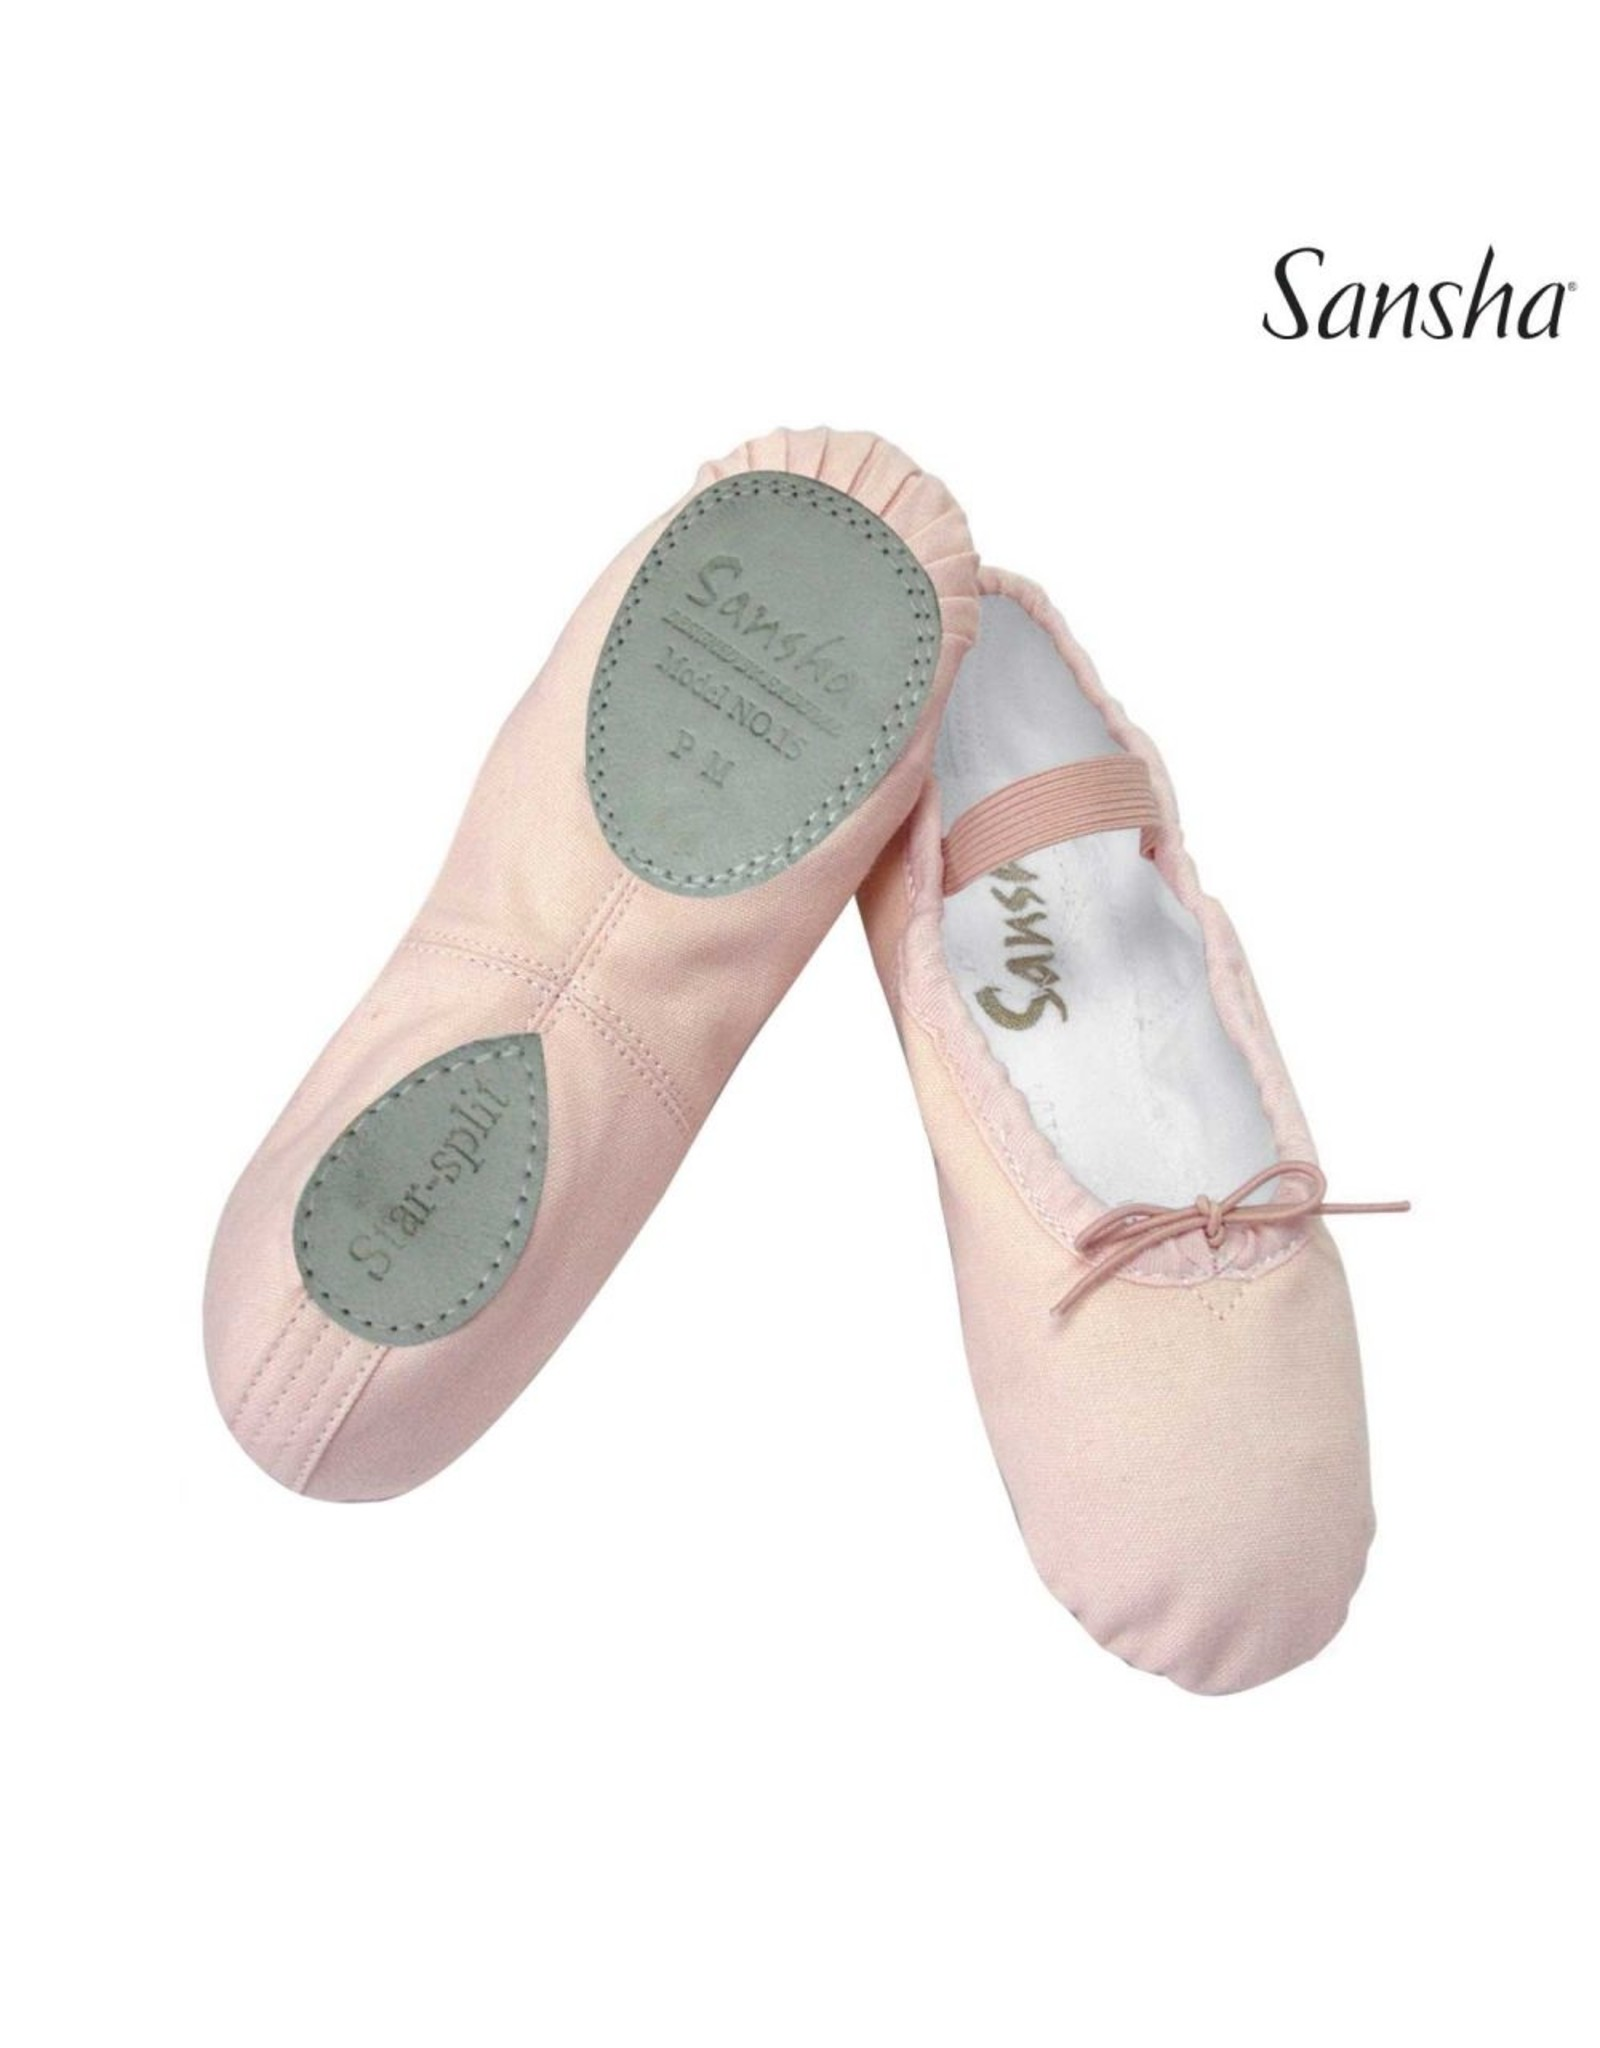 CHILDREN'S SANSHA SPLIT SOLE CANVAS BALLET SLIPPER